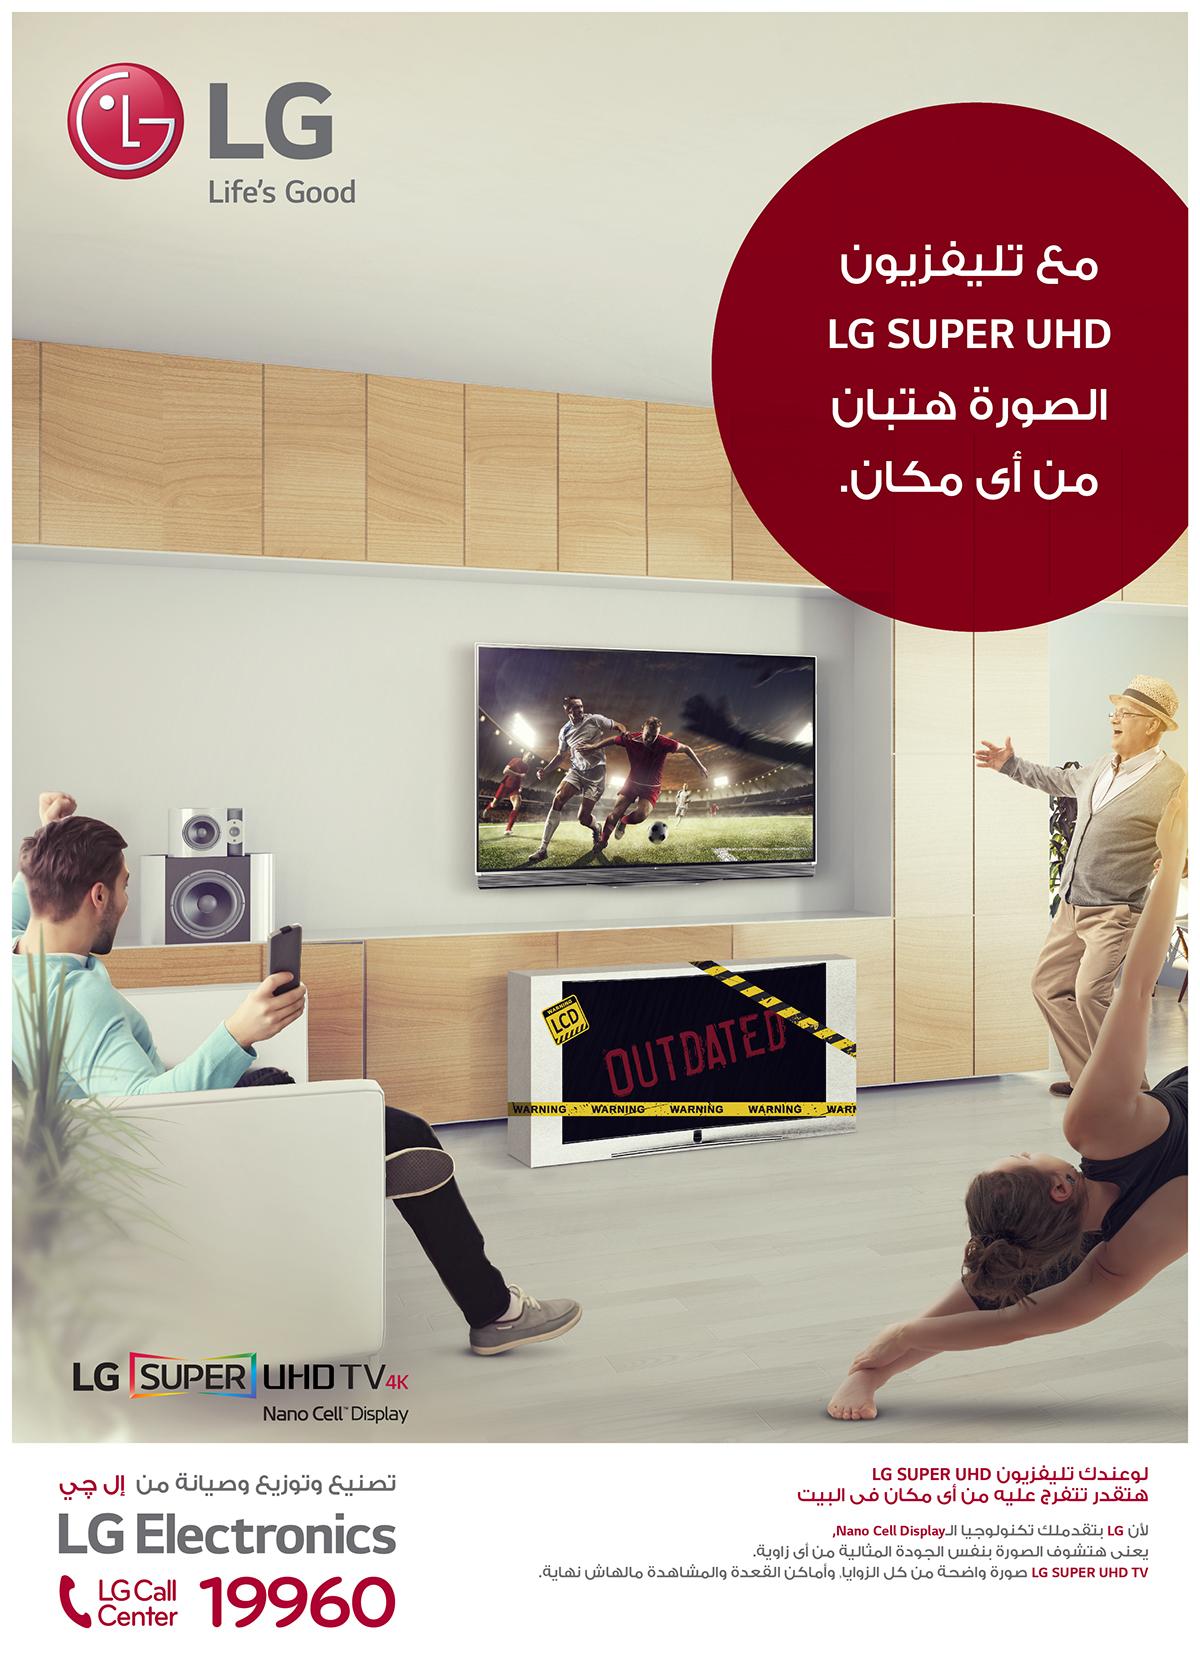 Project LG Newspaper Ads